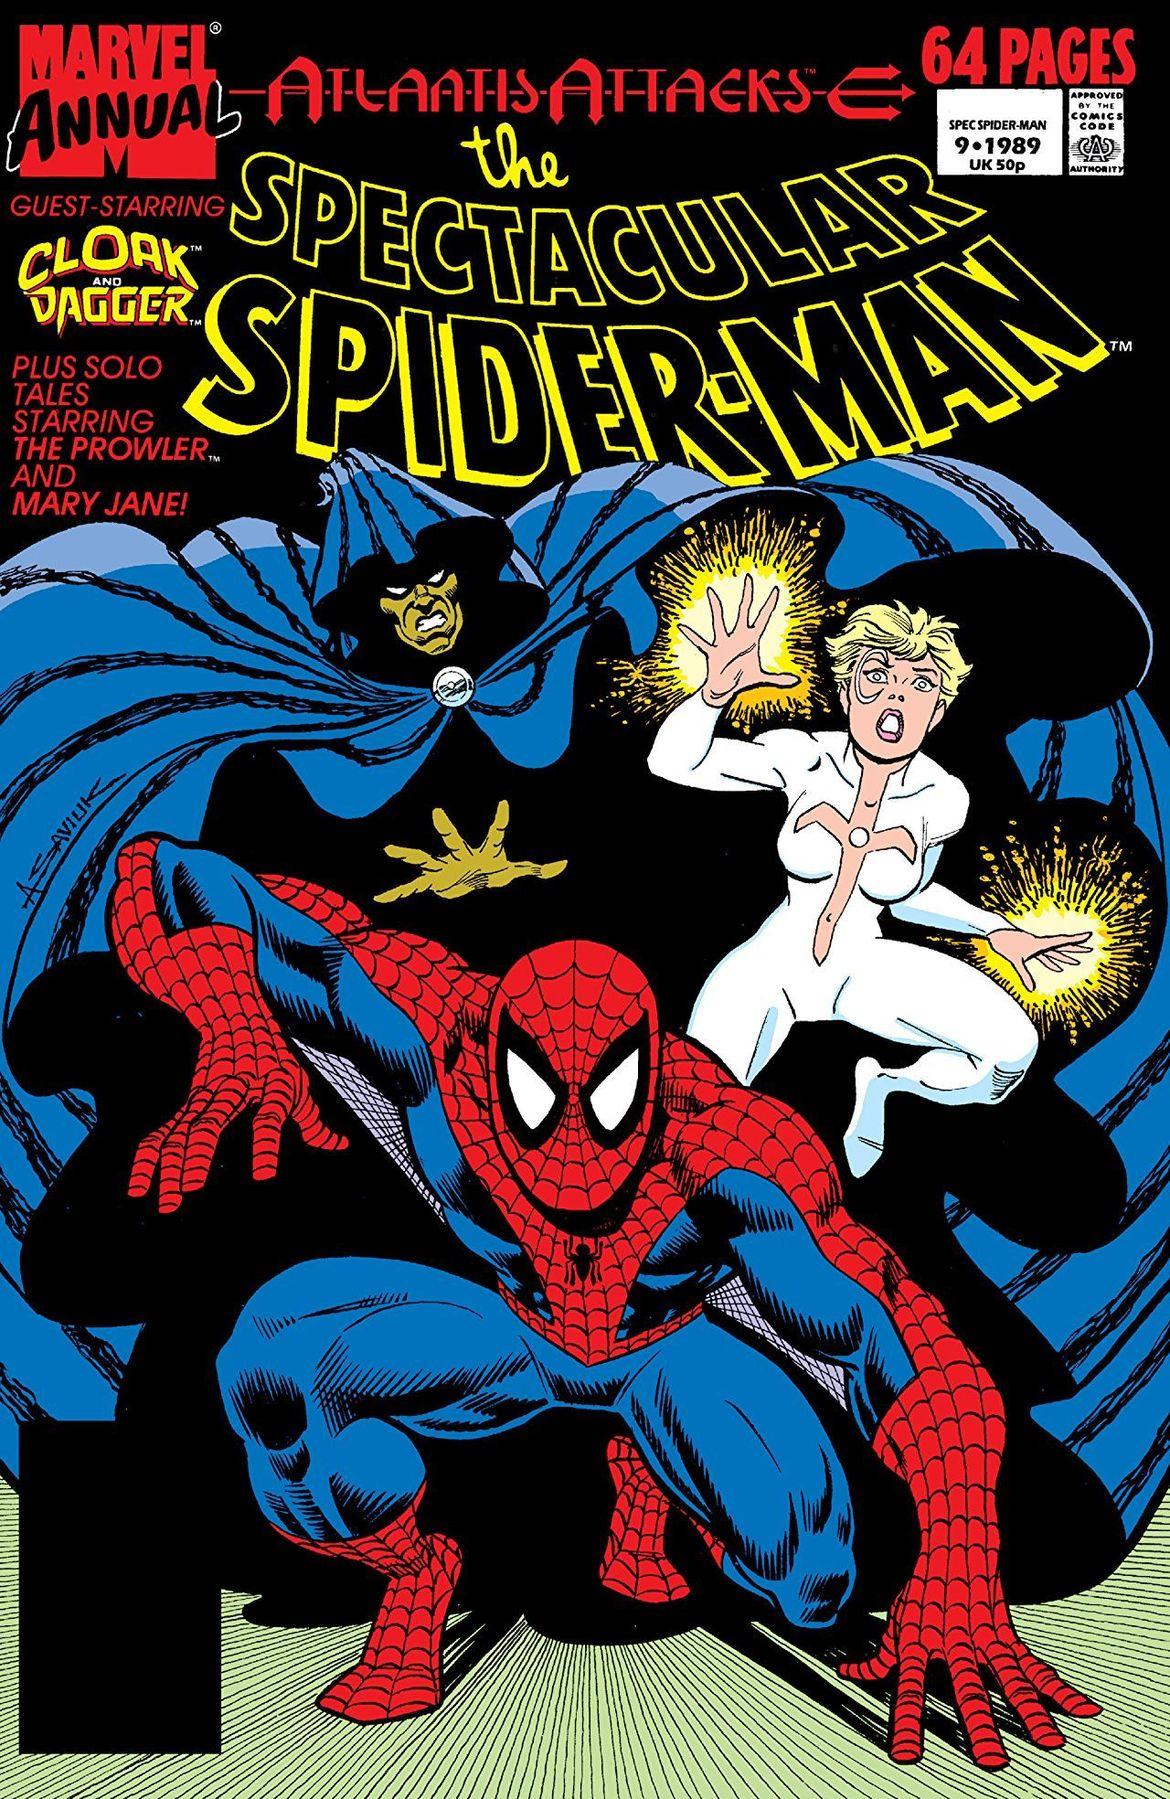 77e1fa61 Roy Thomas on the end of Amazing Spider-Man comic strip